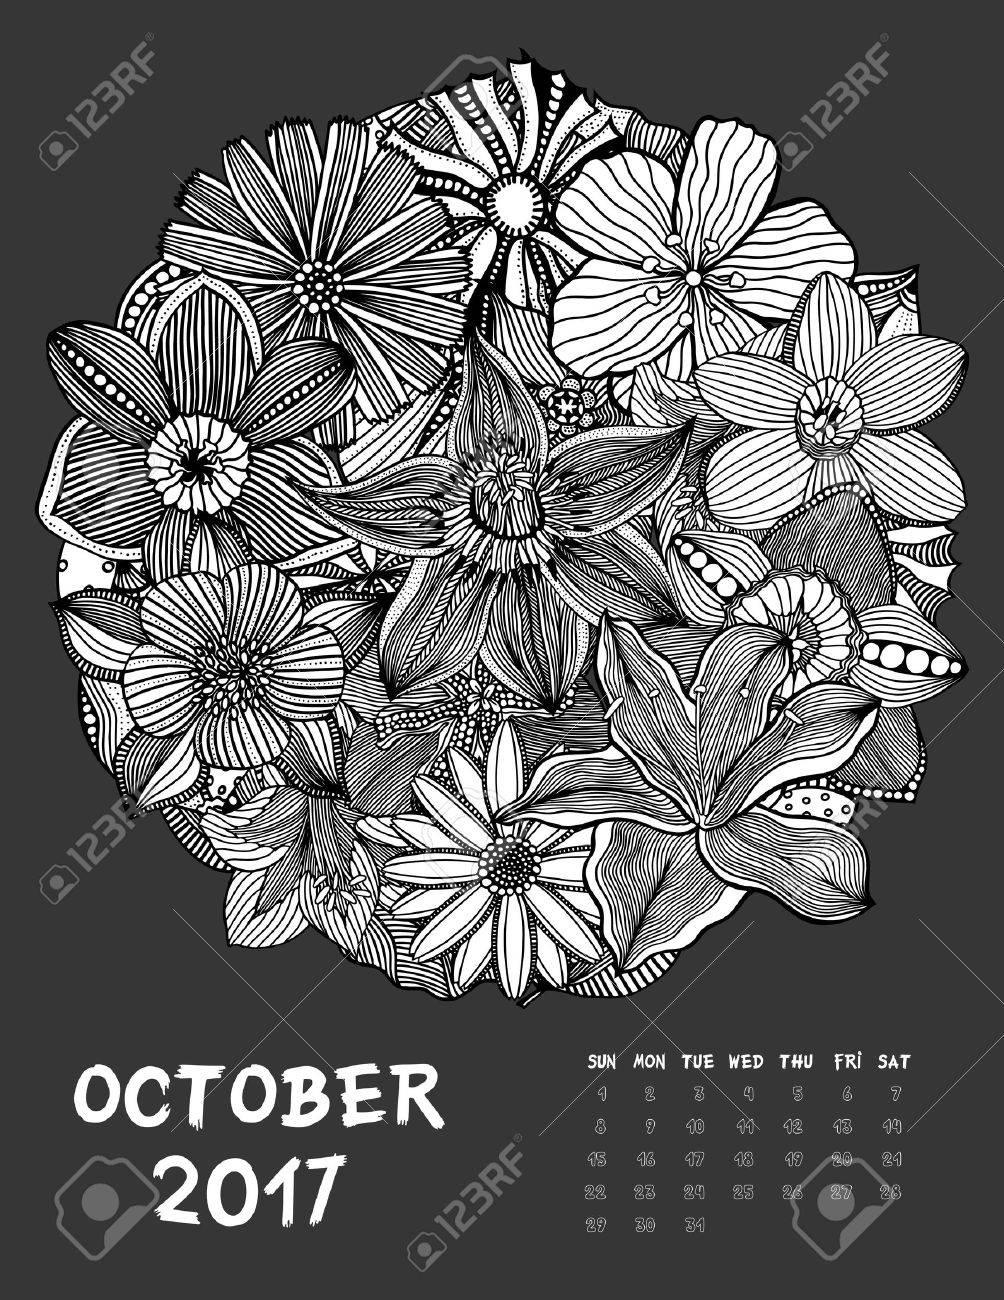 october 2017 calendar line art black and white illustration